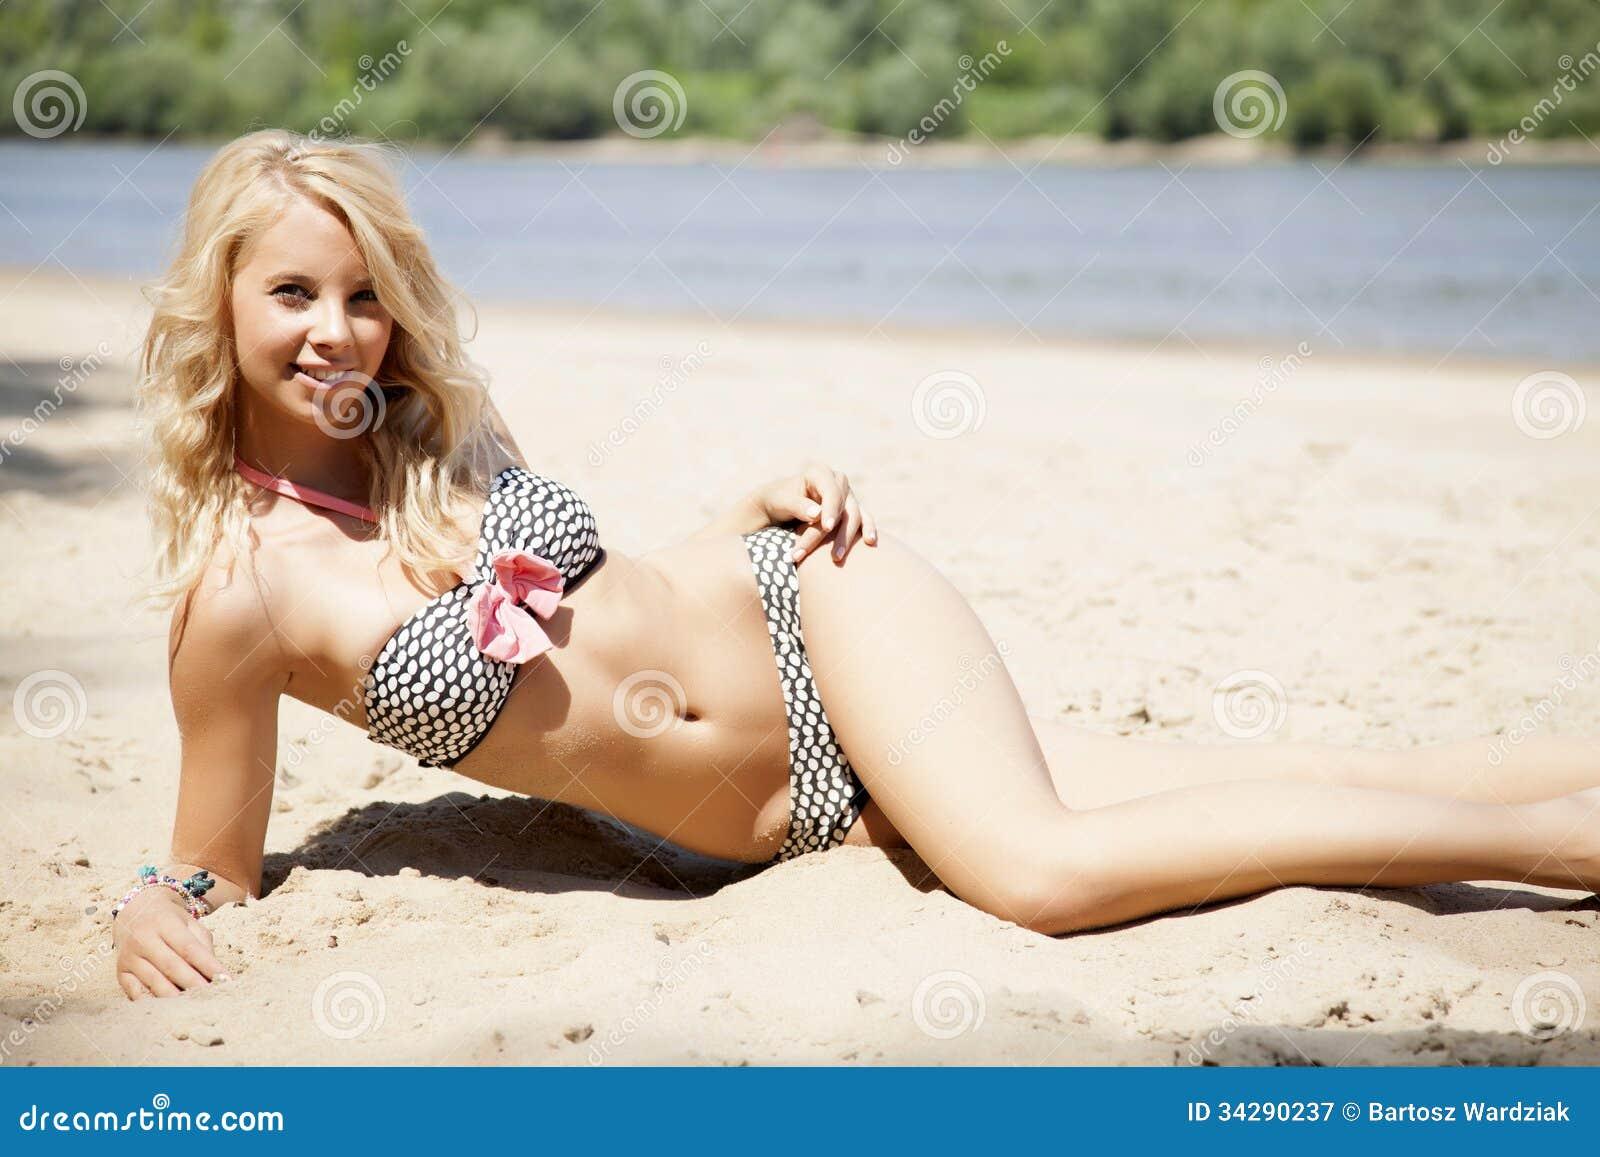 bikini beach adult